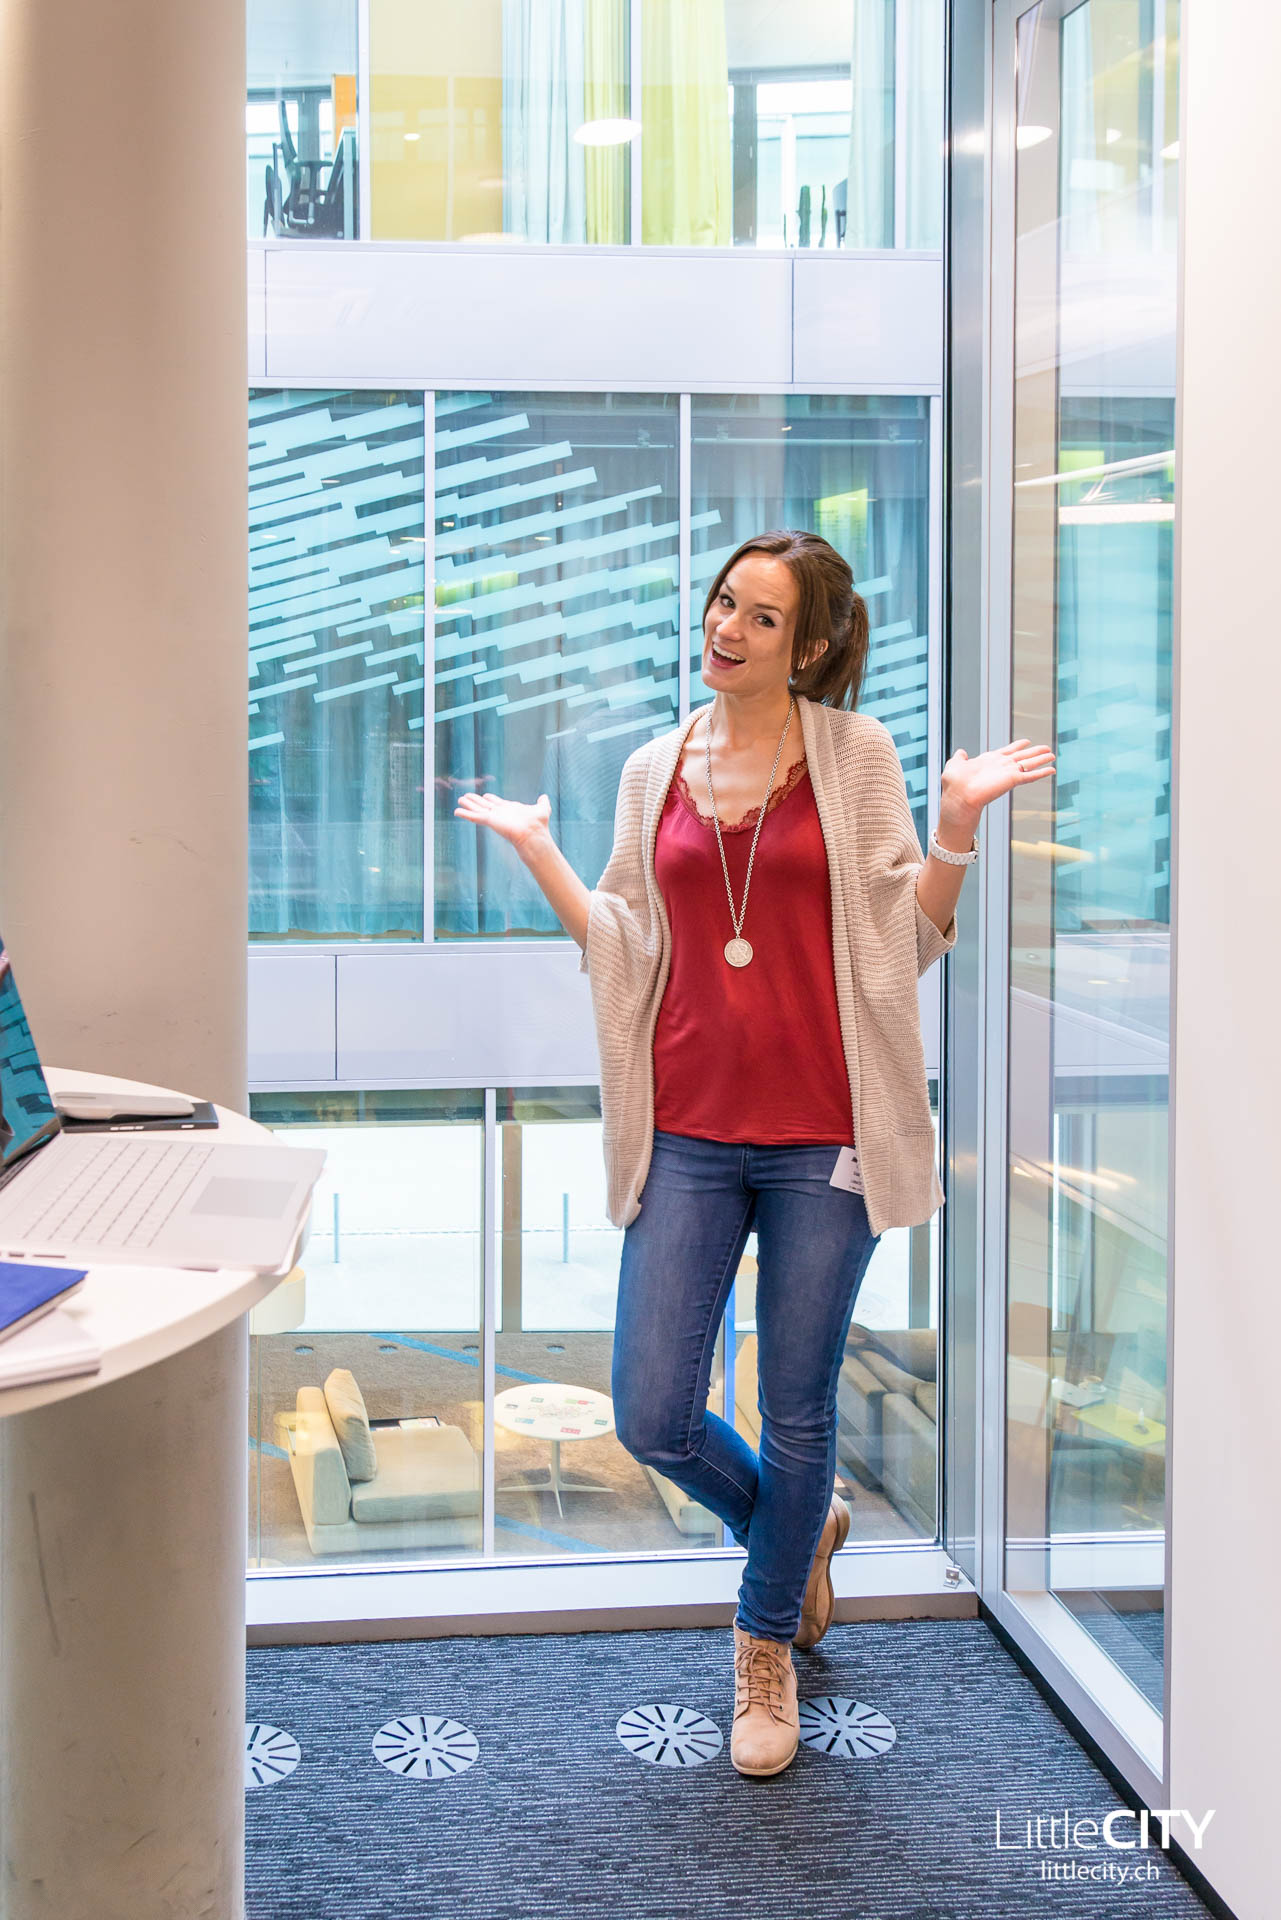 Microsoft Schweiz Büros LittleCITY-2